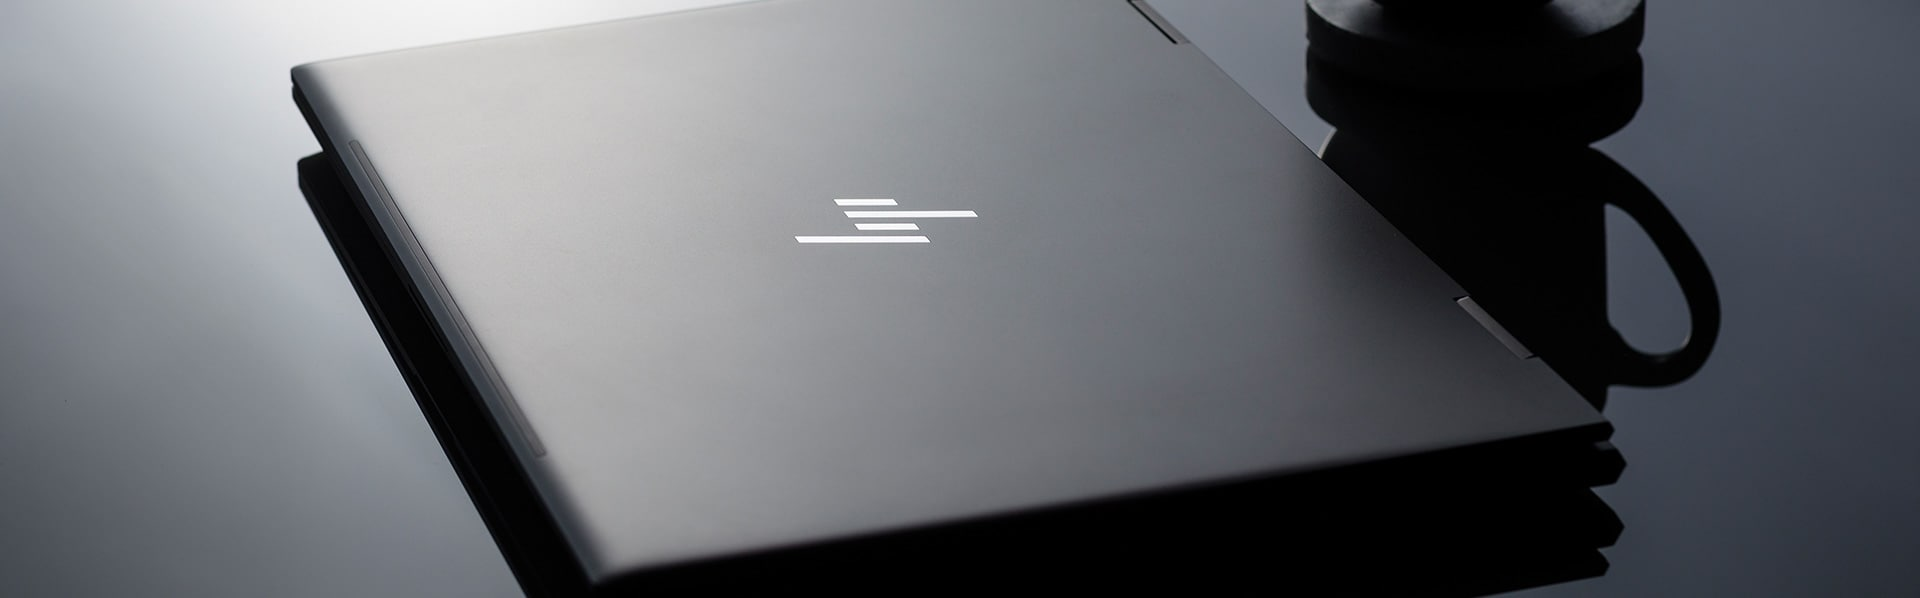 HP ENVY x360 15m-cp0011dx AMD Ryzen 5 2500U (2 00 GHz) 8 GB Memory 128 GB  SSD AMD Radeon Vega 8 15 6